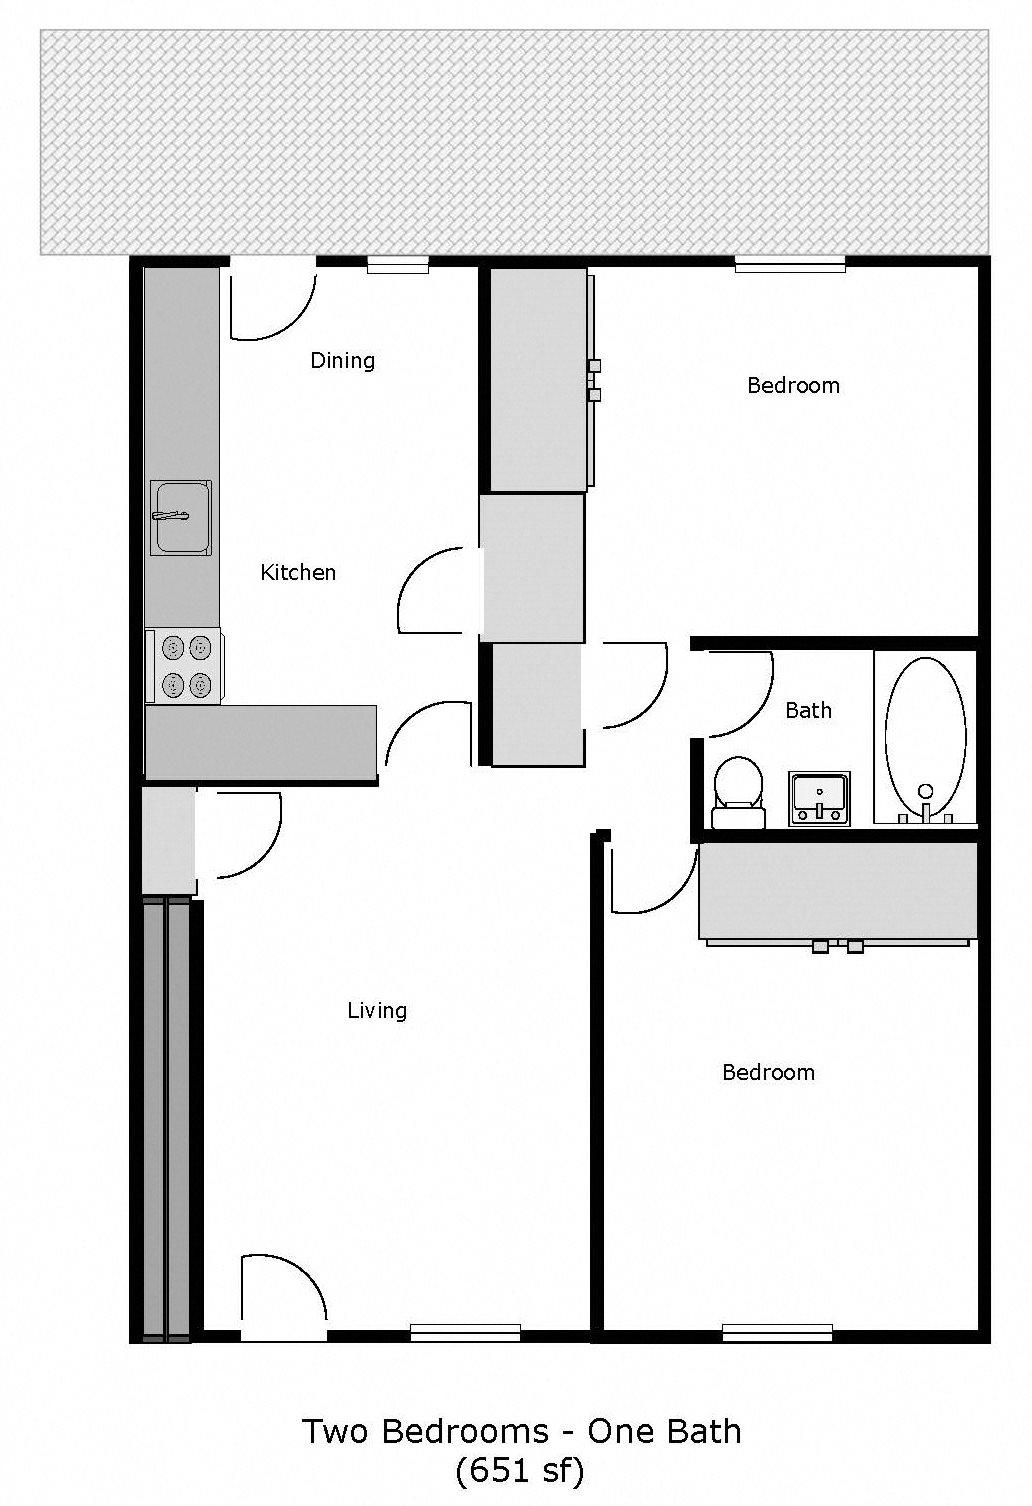 Jackson Street Apartments - 500 Jackson St, Fairfield - 2 Bed 1 Bath Floor Plan 3